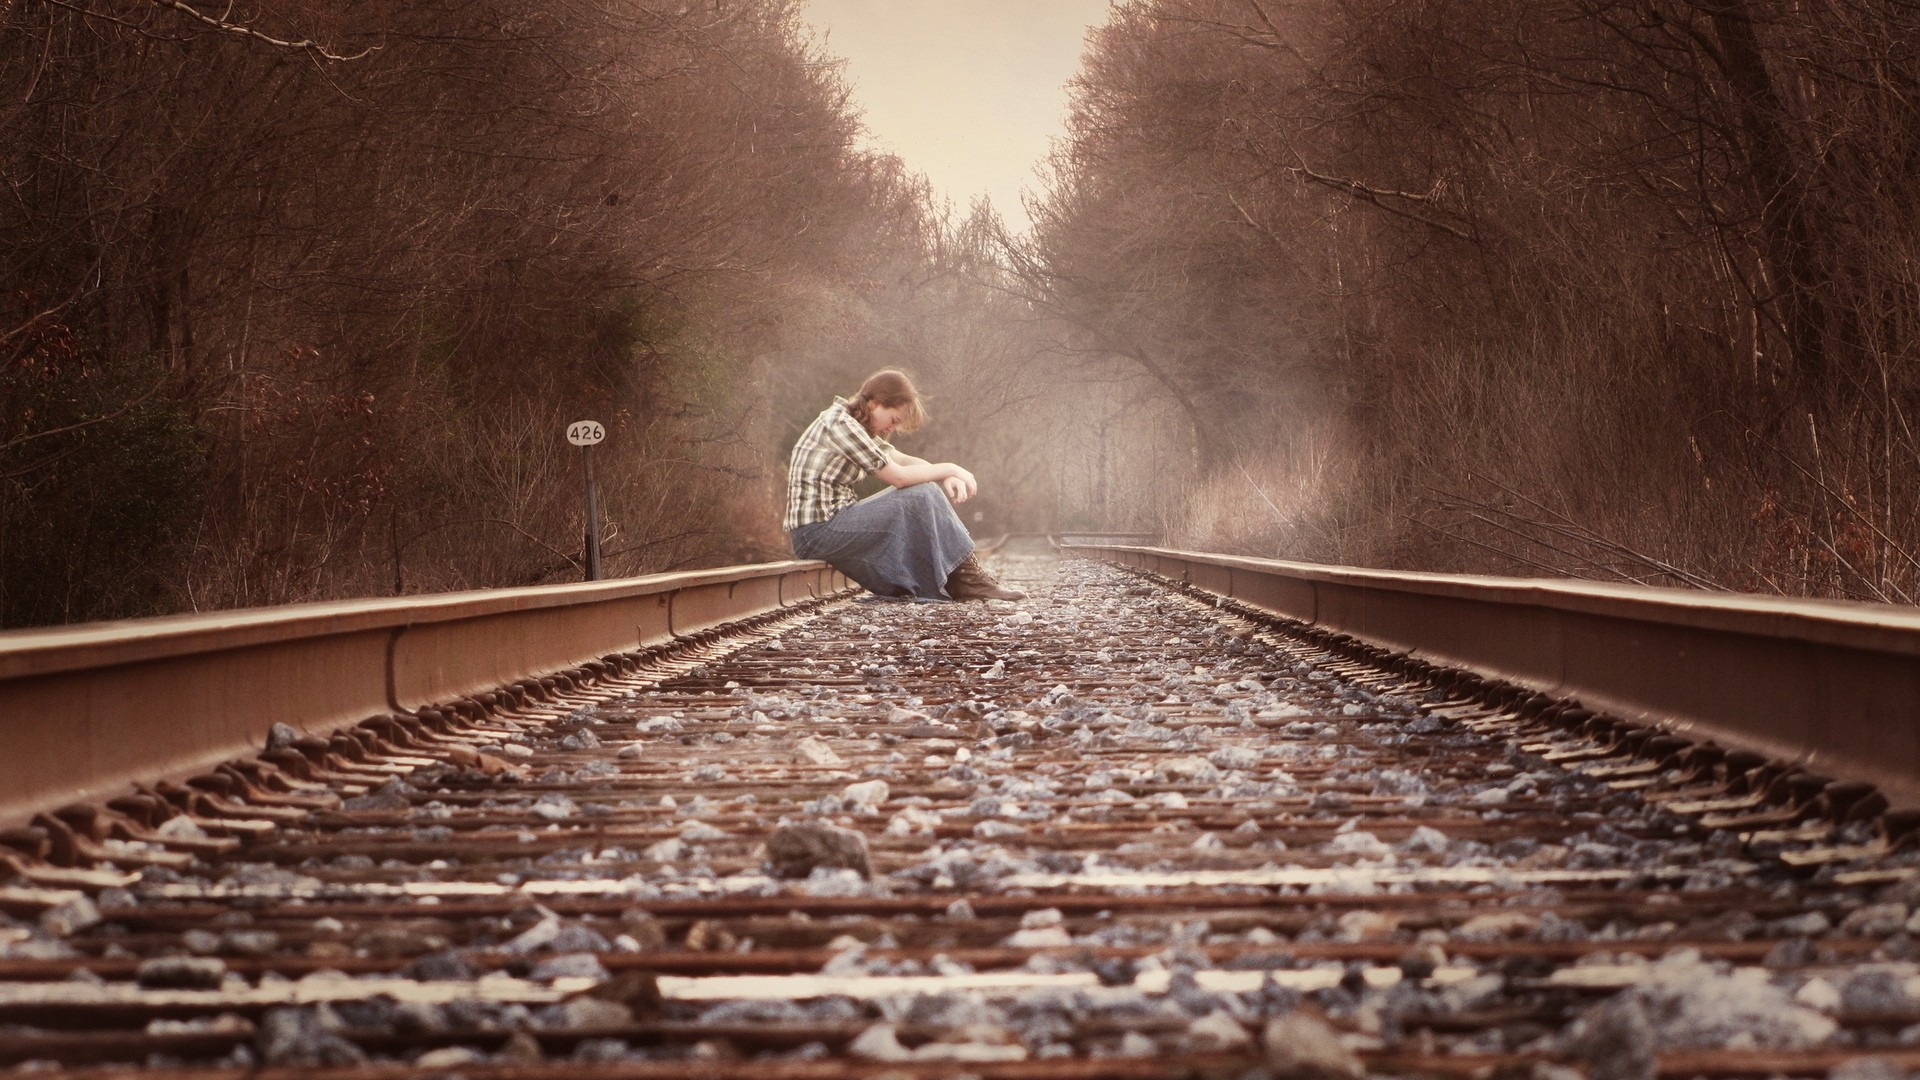 Alone Sad Wallpaper theme